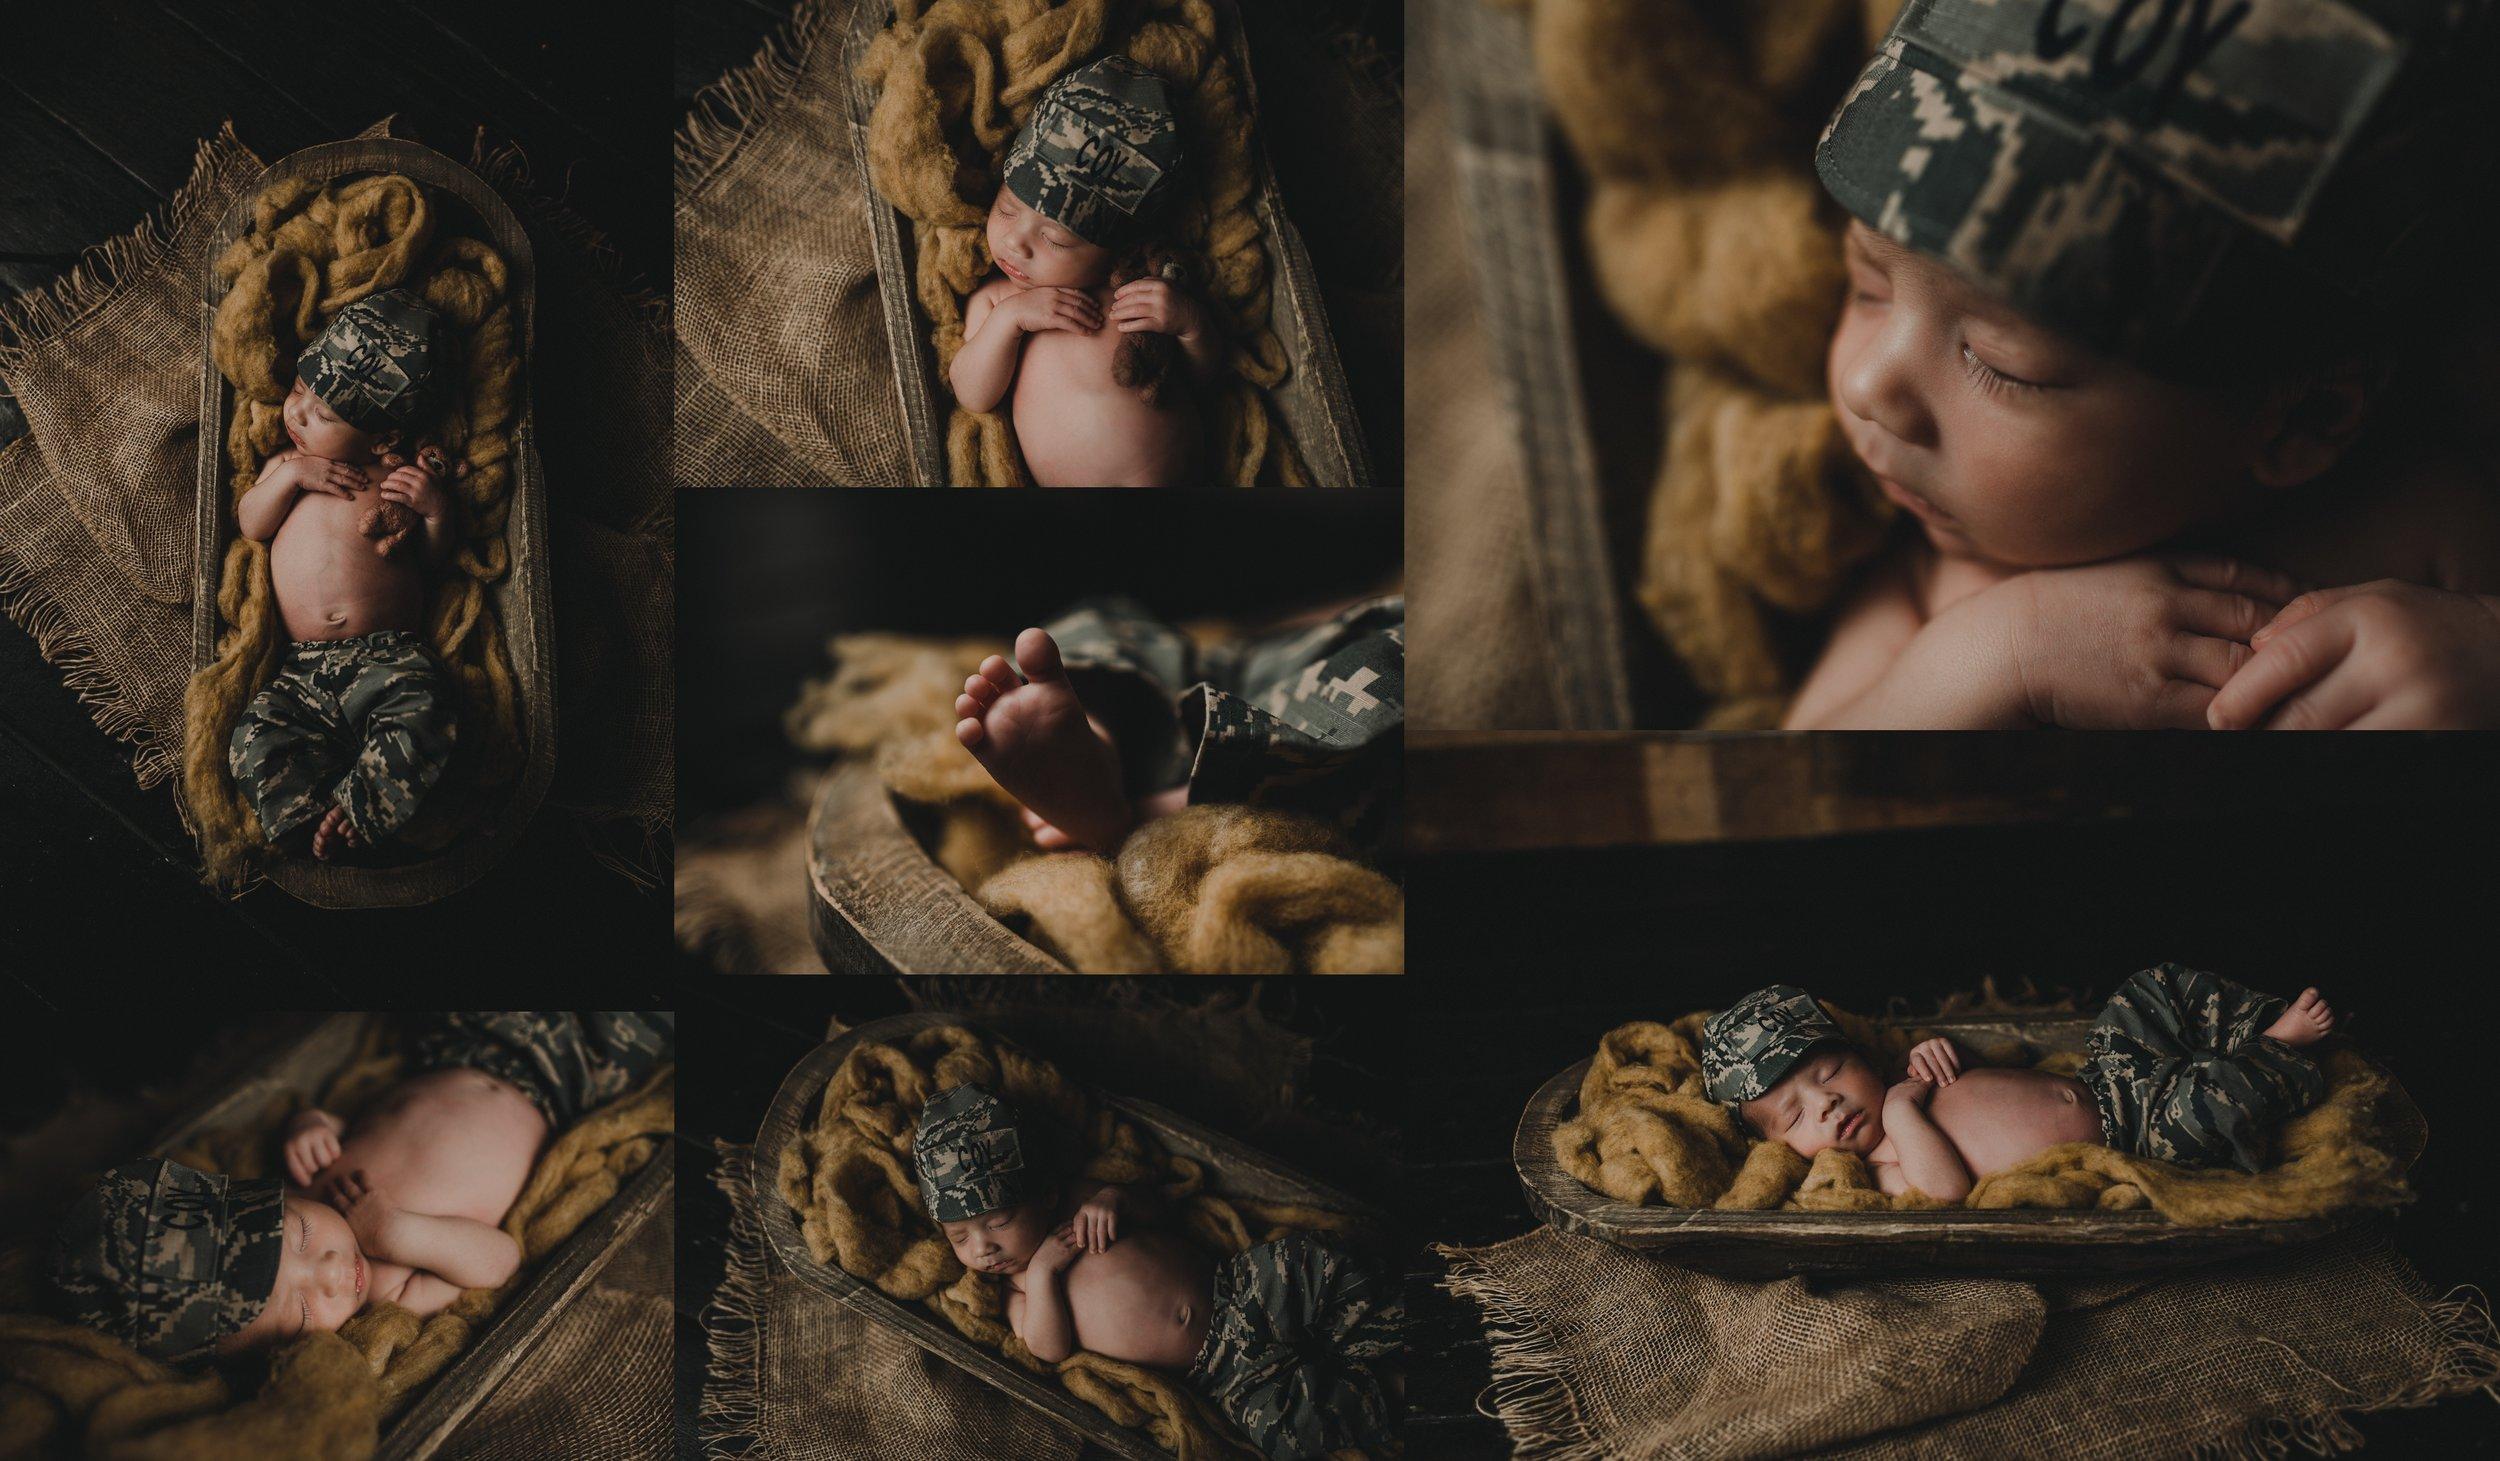 Rustic Newborn Photo Session | Baby Boy | Farmhouse Newborn Studio Session | Military Baby Boy | Terry Farms Photography